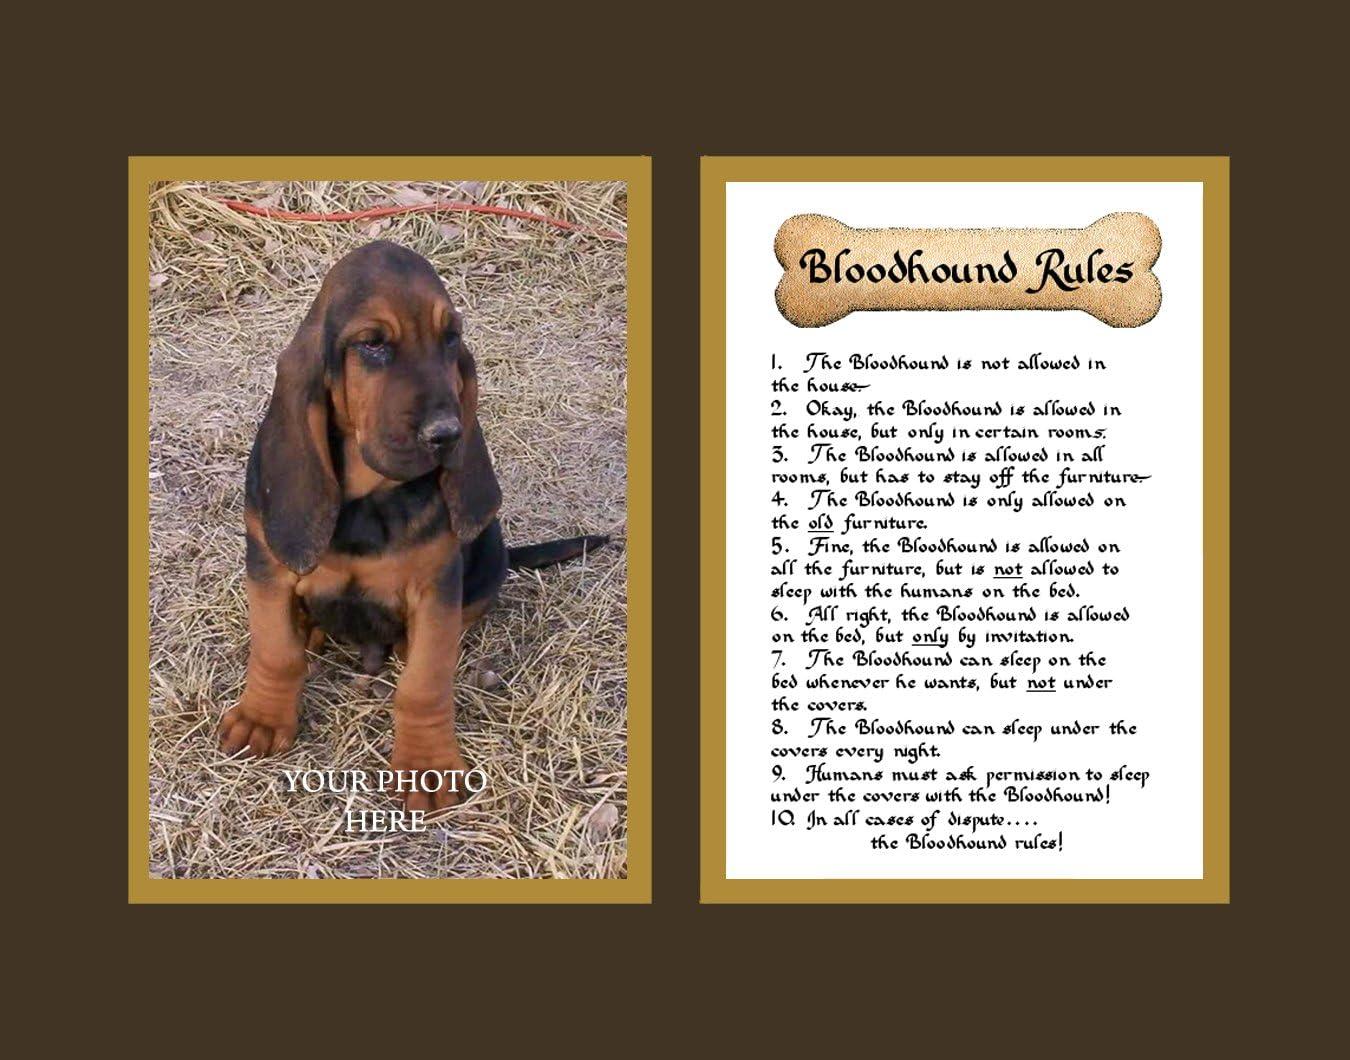 Dog Rules Bloodhound Wall Decor Pet Saying Dog Saying